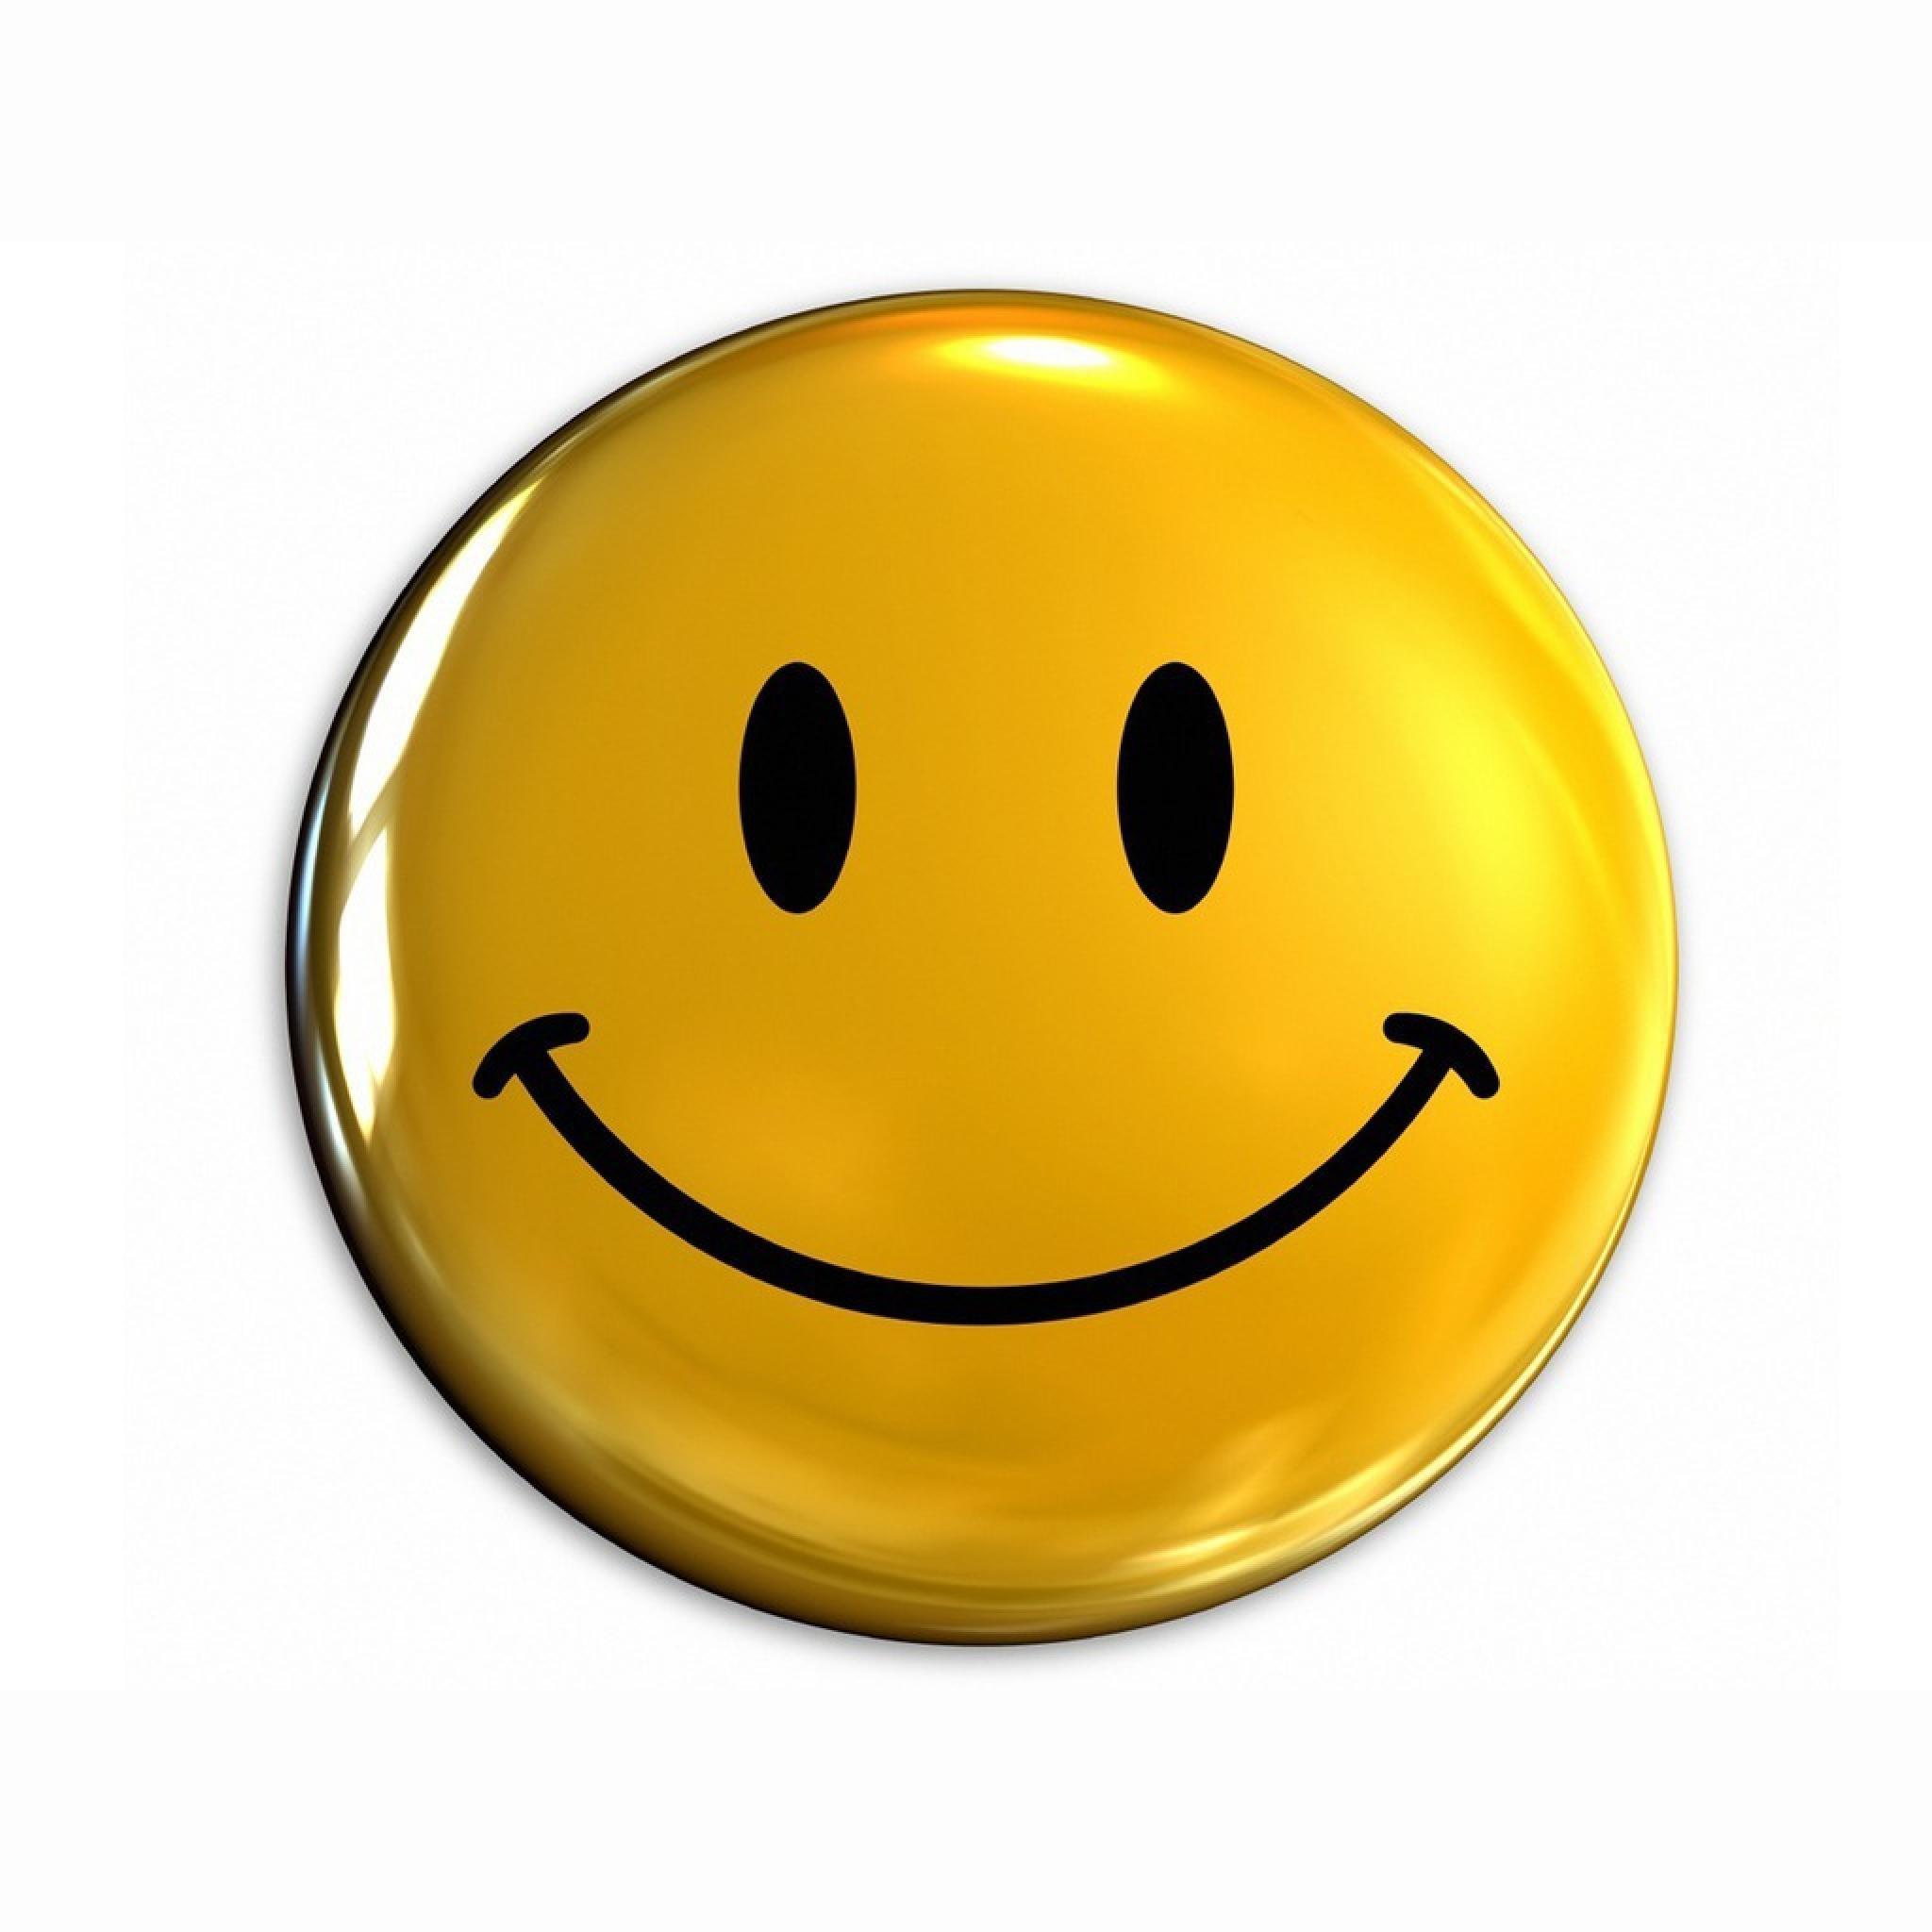 Smiley face wallpaper screensavers wallpapersafari - The north face wallpaper for iphone ...